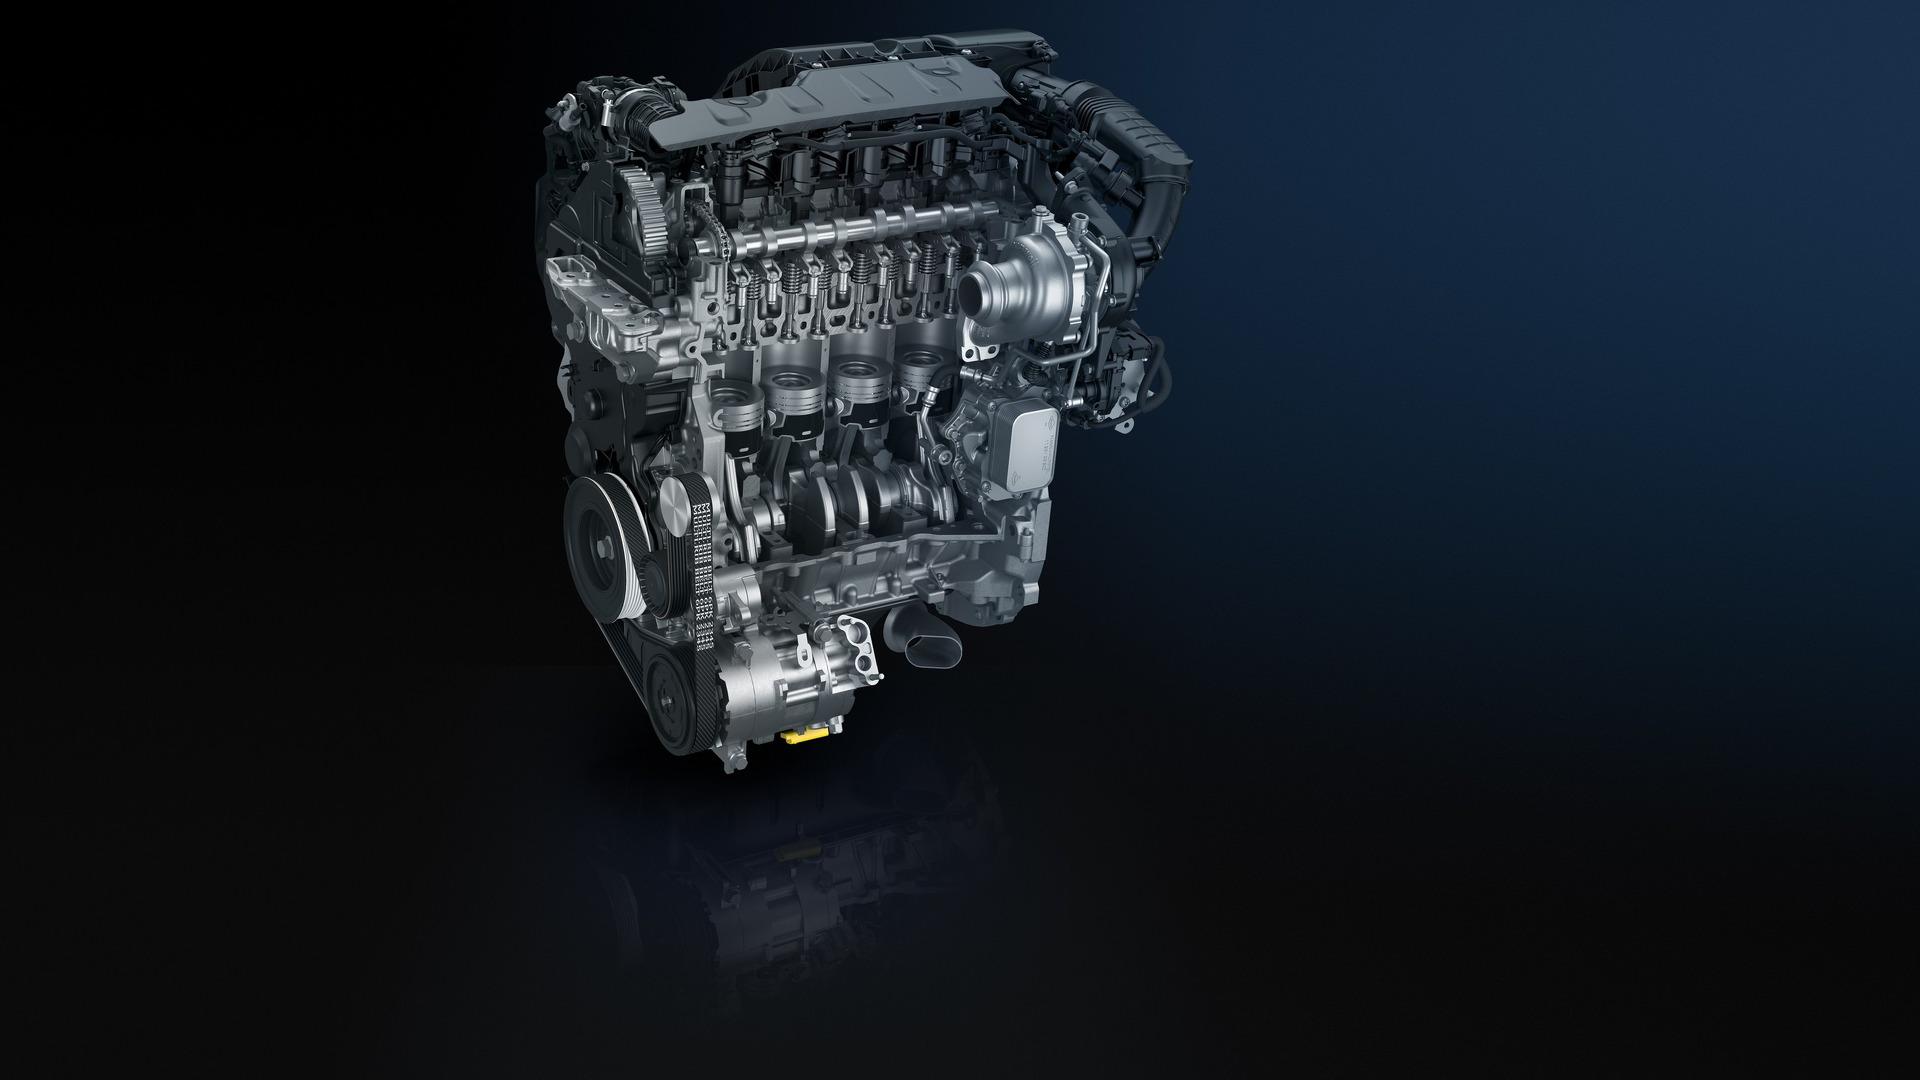 2018-peugeot-308-facelift (9)